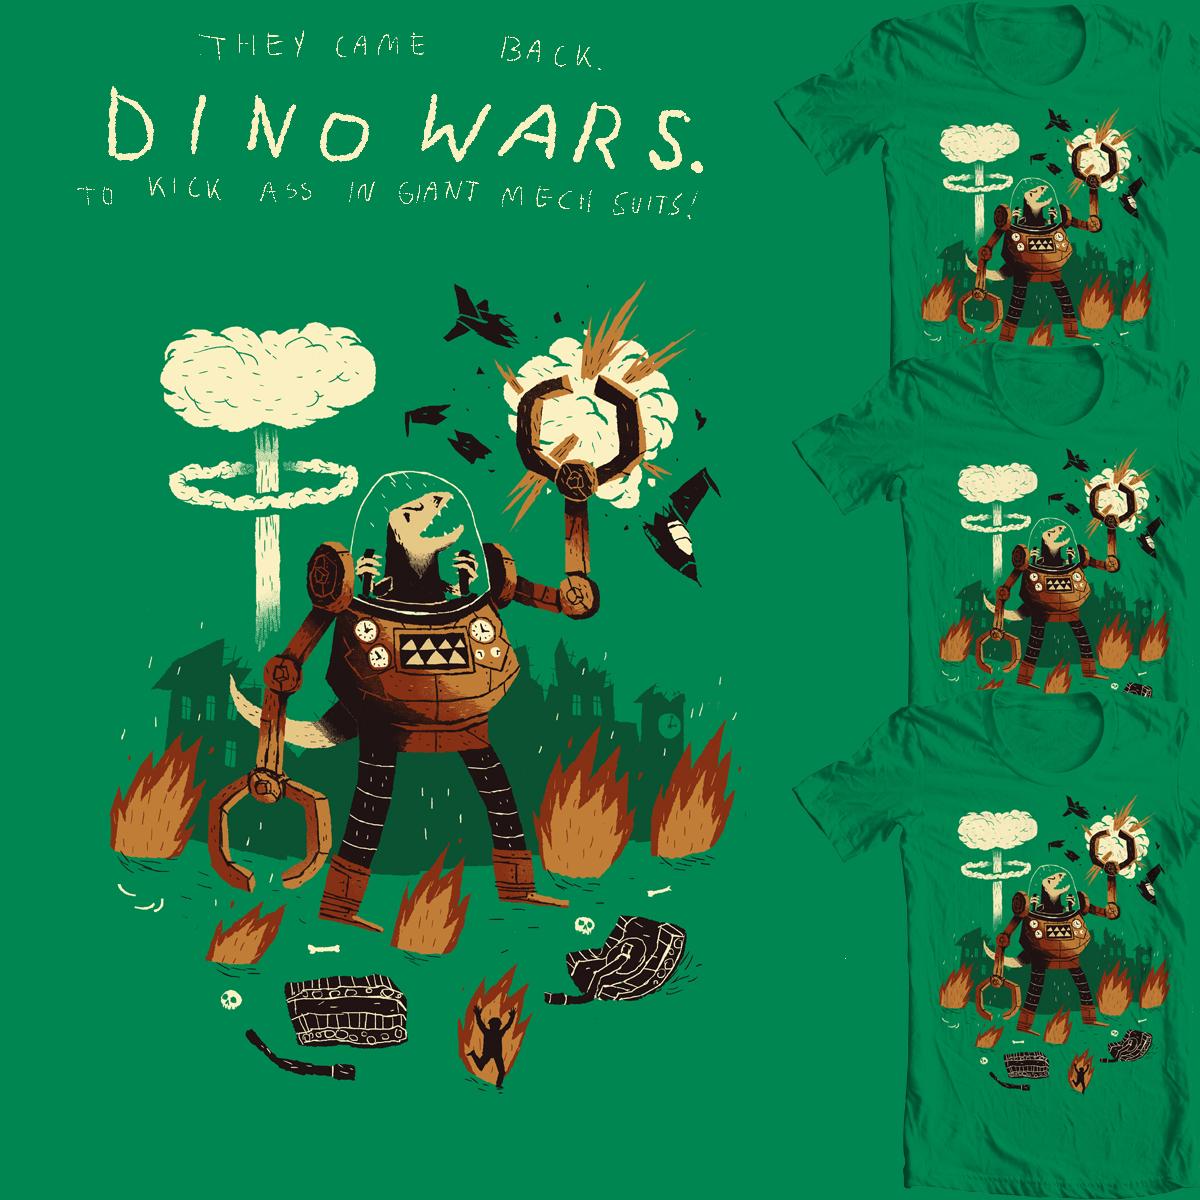 dino wars. by louisroskosch on Threadless